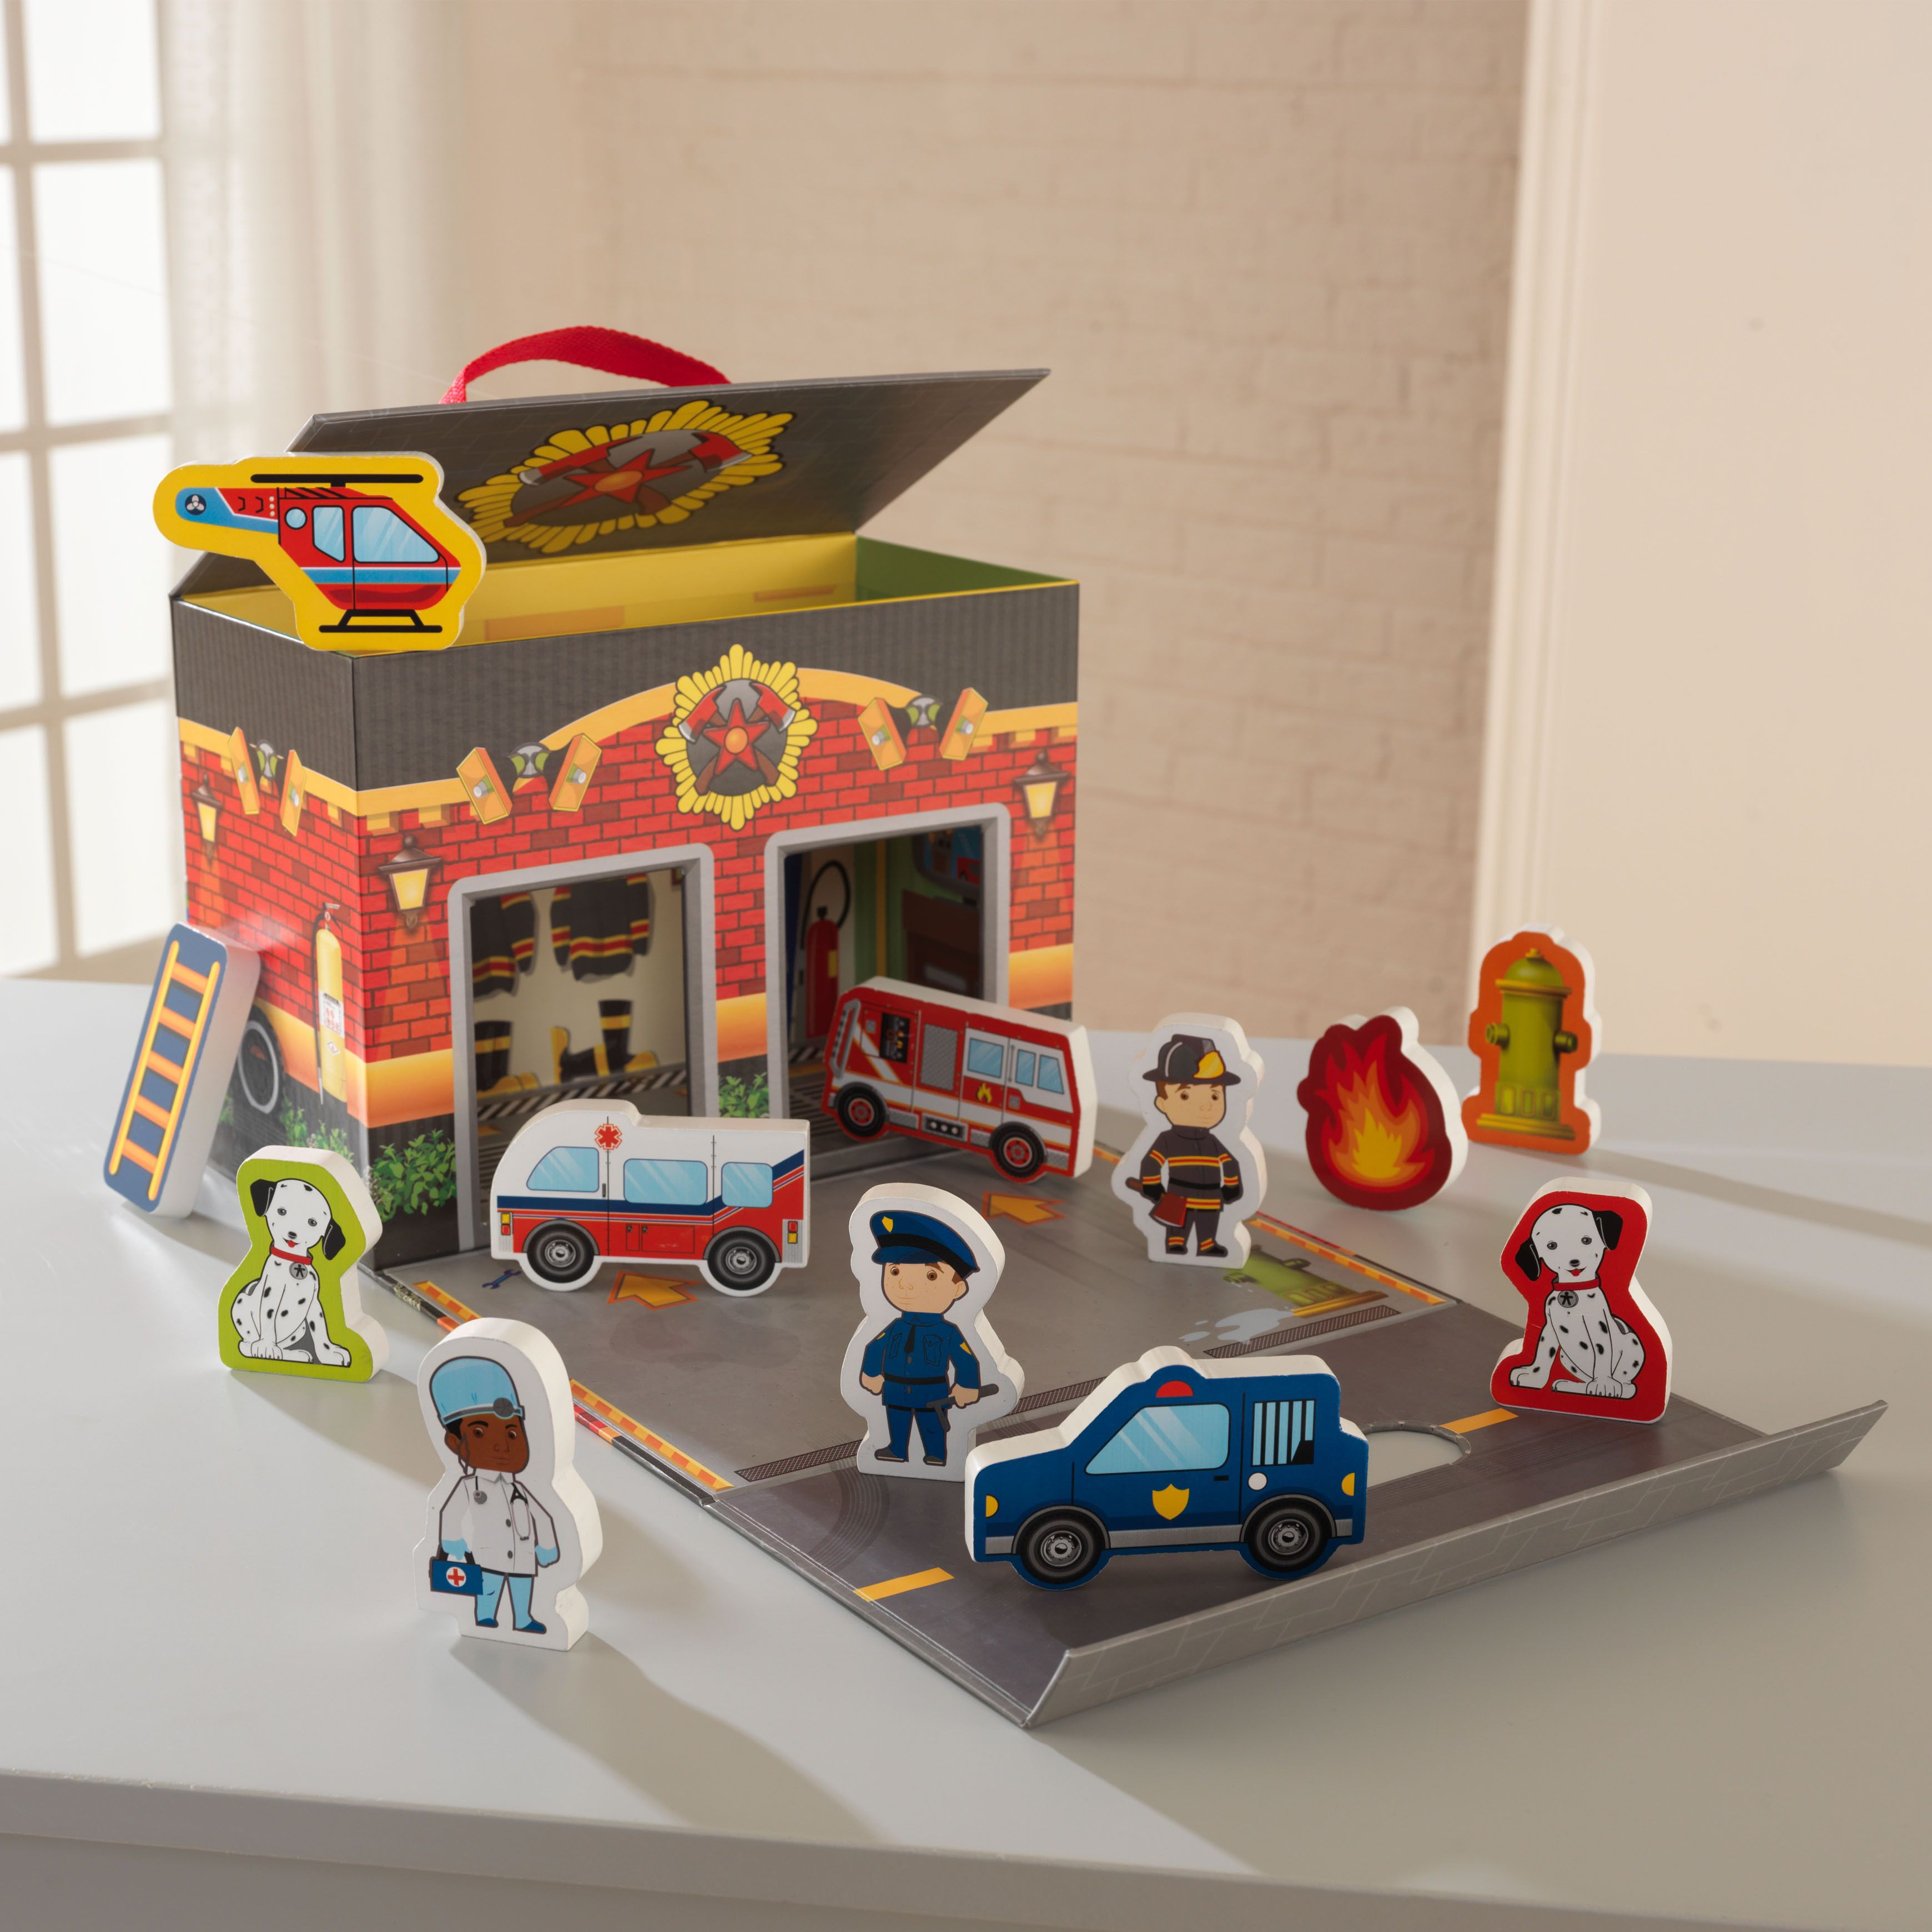 Baby girl car toys  KidKraft Emergency Room Resuce Travel Box Play Set  crafts misc